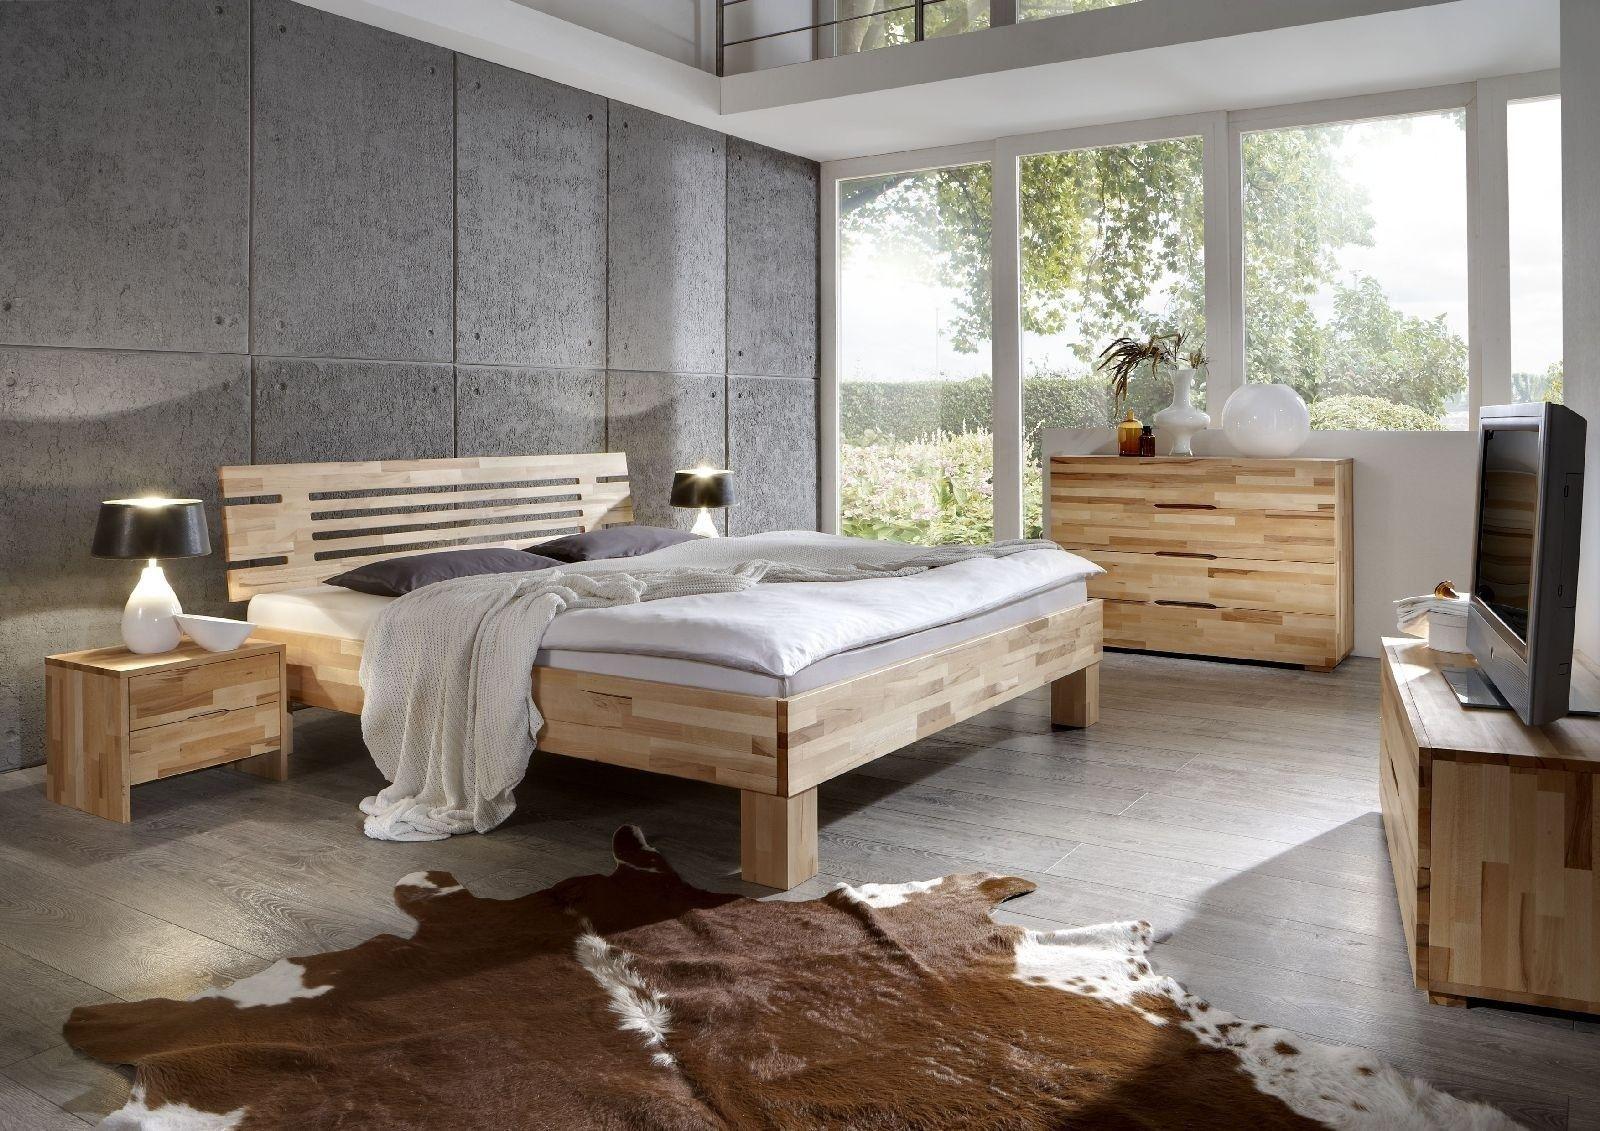 Houten Bed Dico Classic Ledikant Beuken Massief Houten